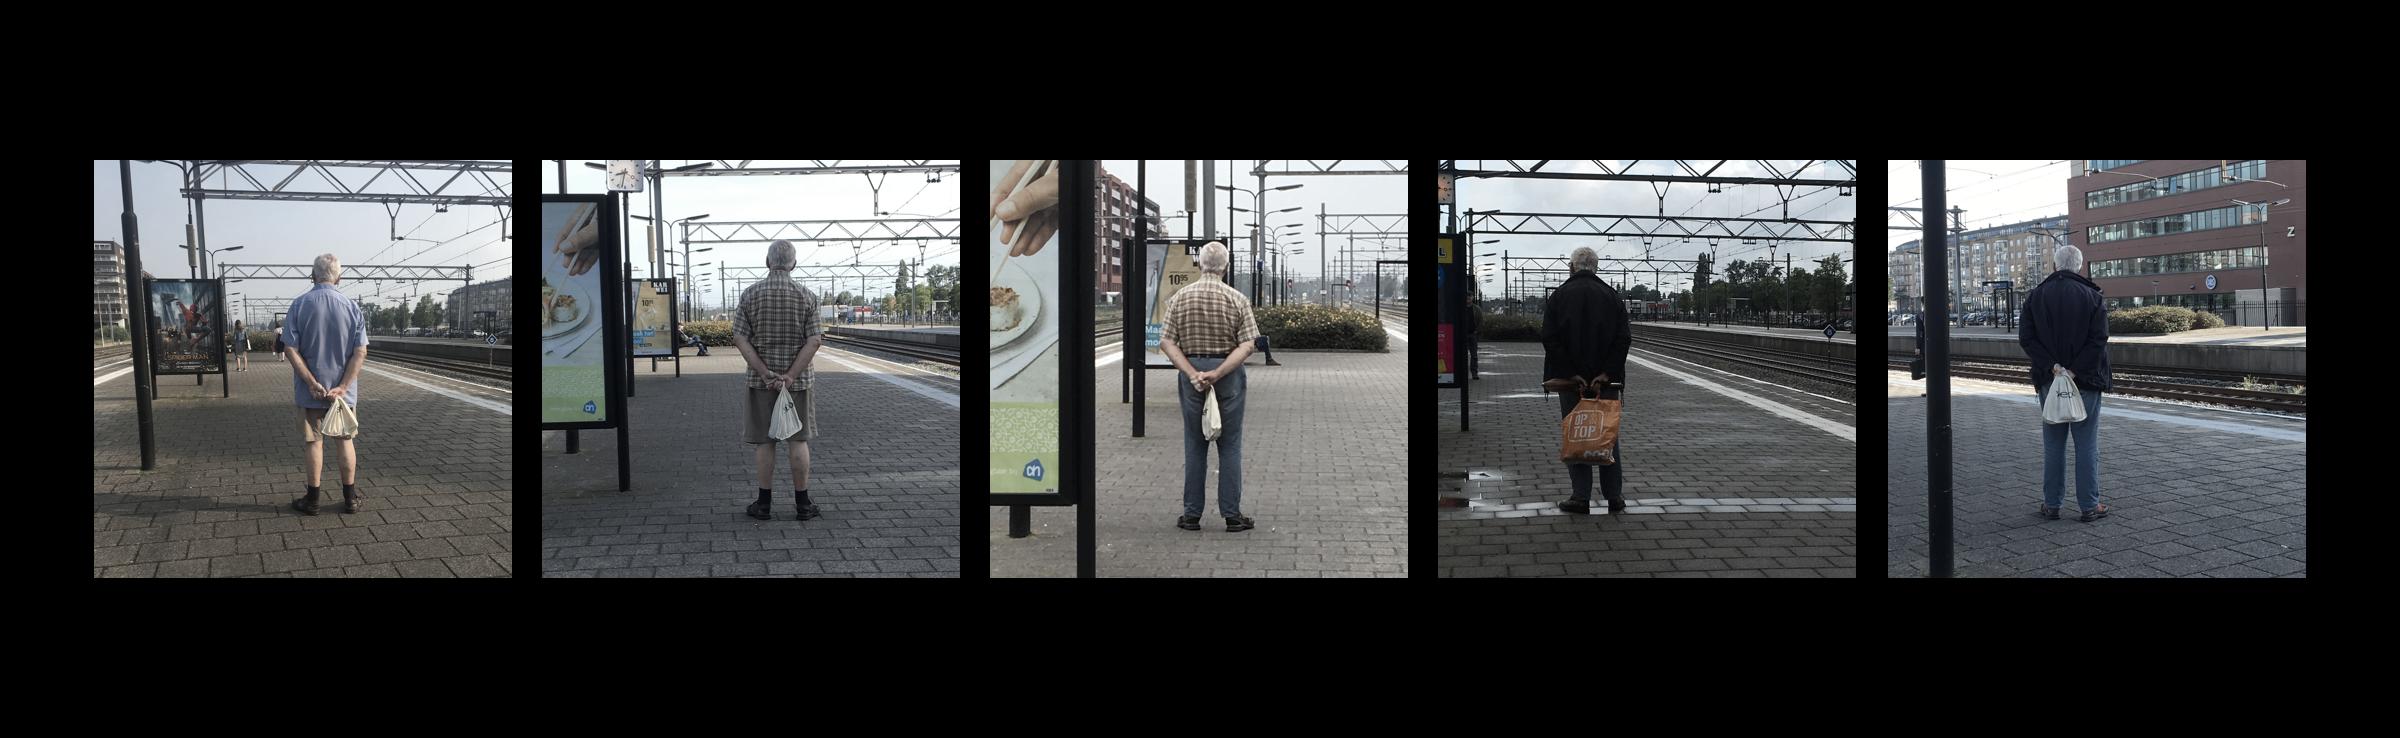 station-guy.png